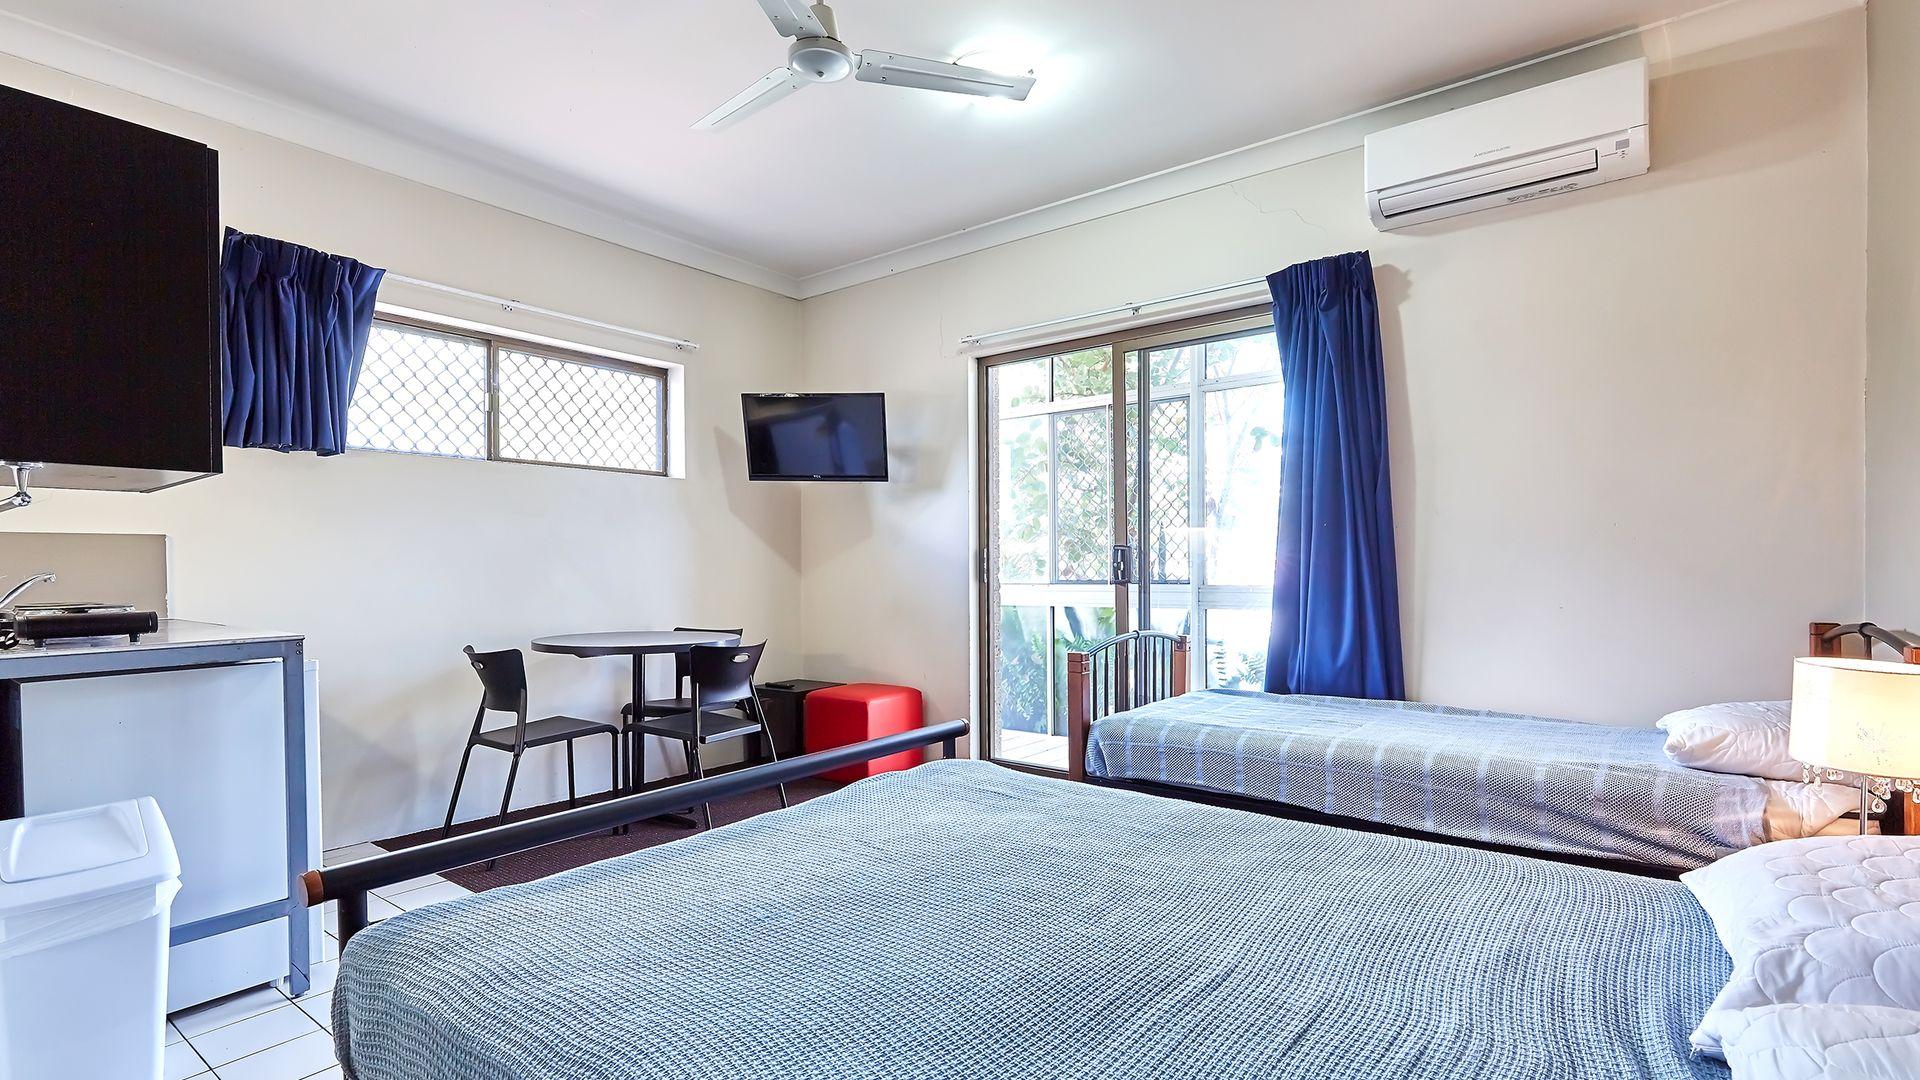 204 Ipswich Road, Woolloongabba QLD 4102, Image 2